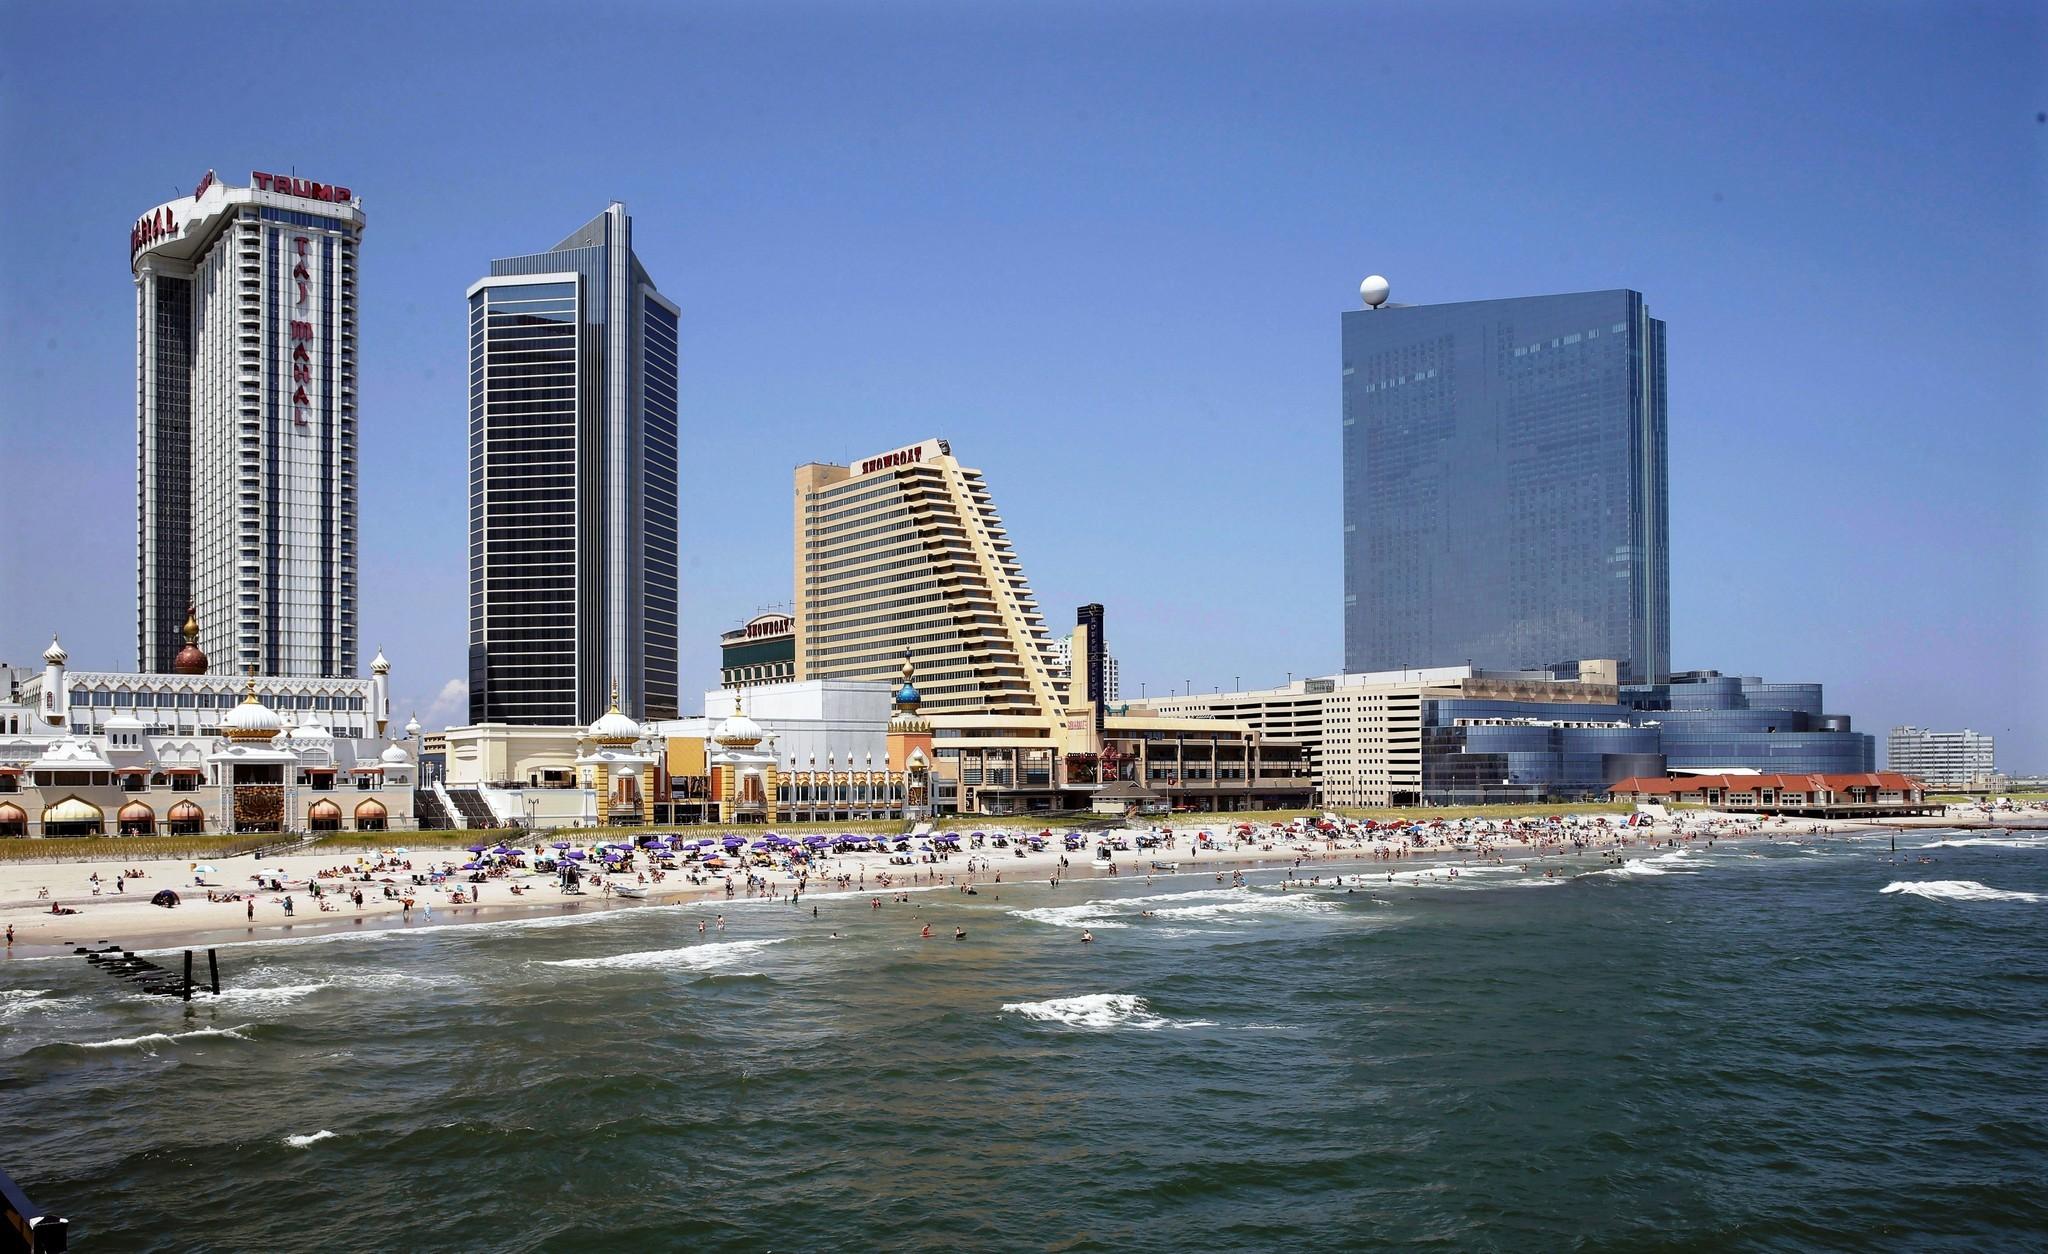 The Revel Atlantic City